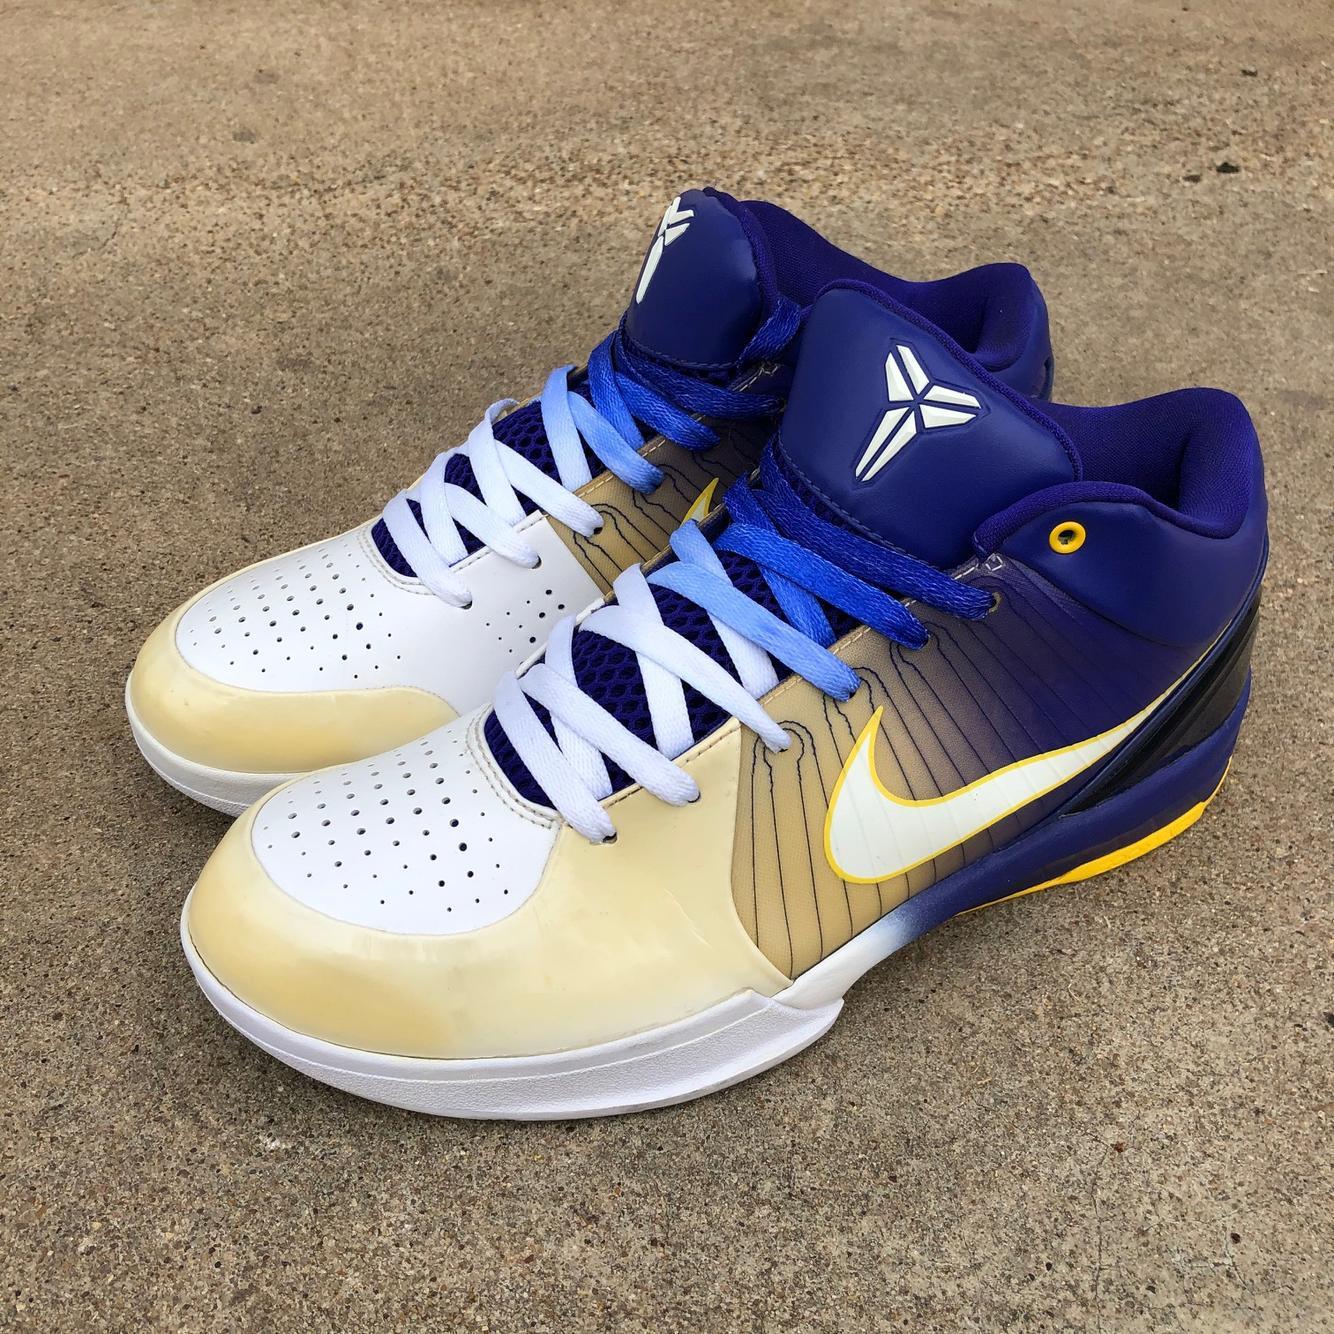 Nike Zoom Kobe 4 'Lakers Home' sz 10.5